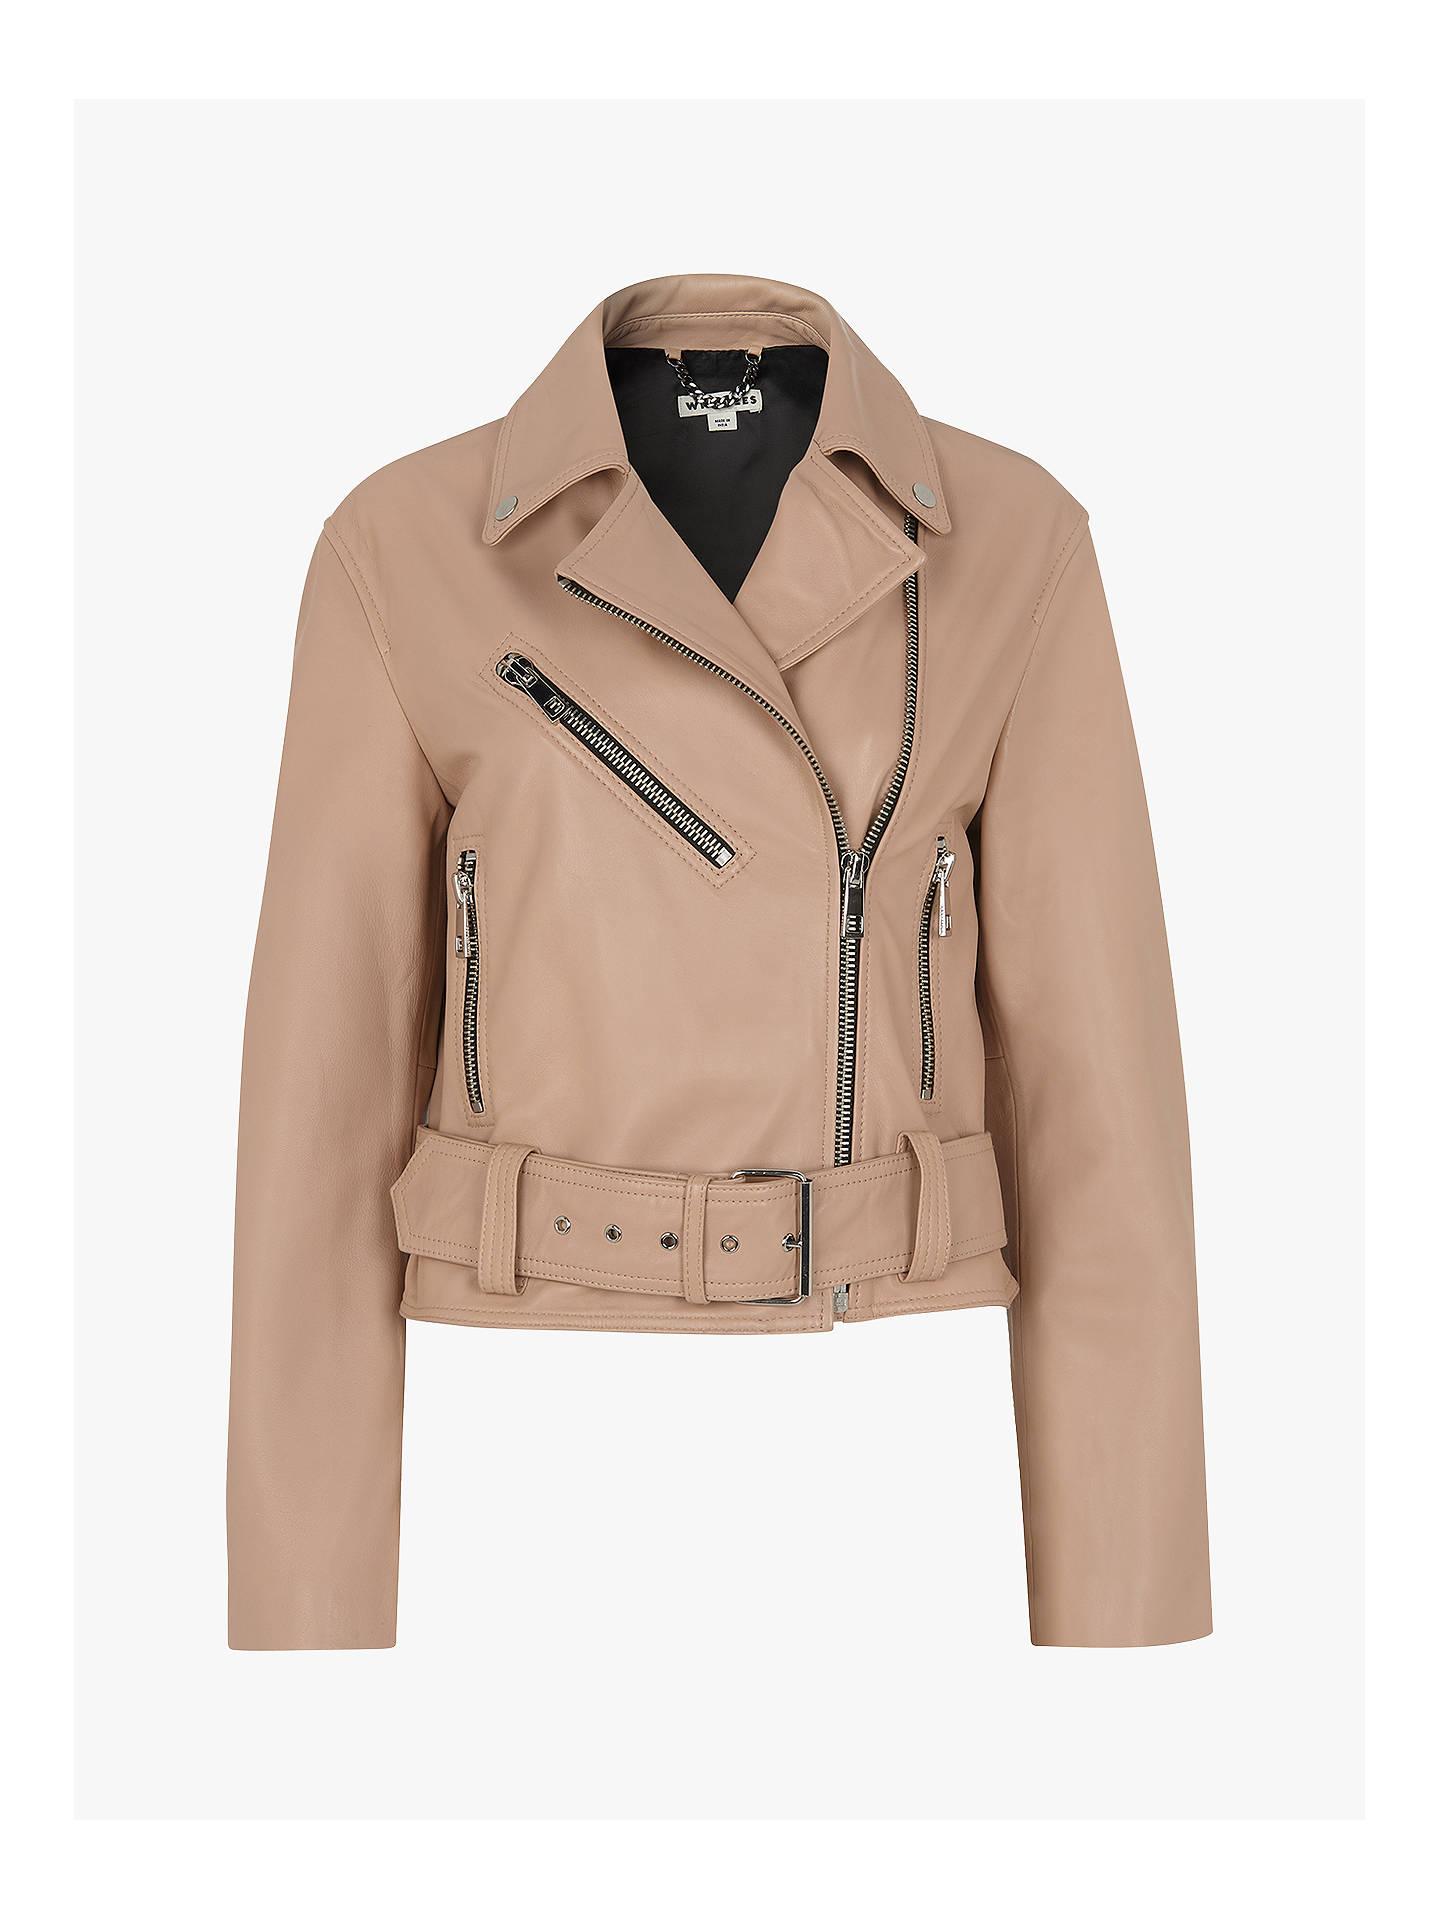 b98972377f ... Buy Whistles Adriana Leather Biker Jacket, Nude, 6 Online at  johnlewis.com